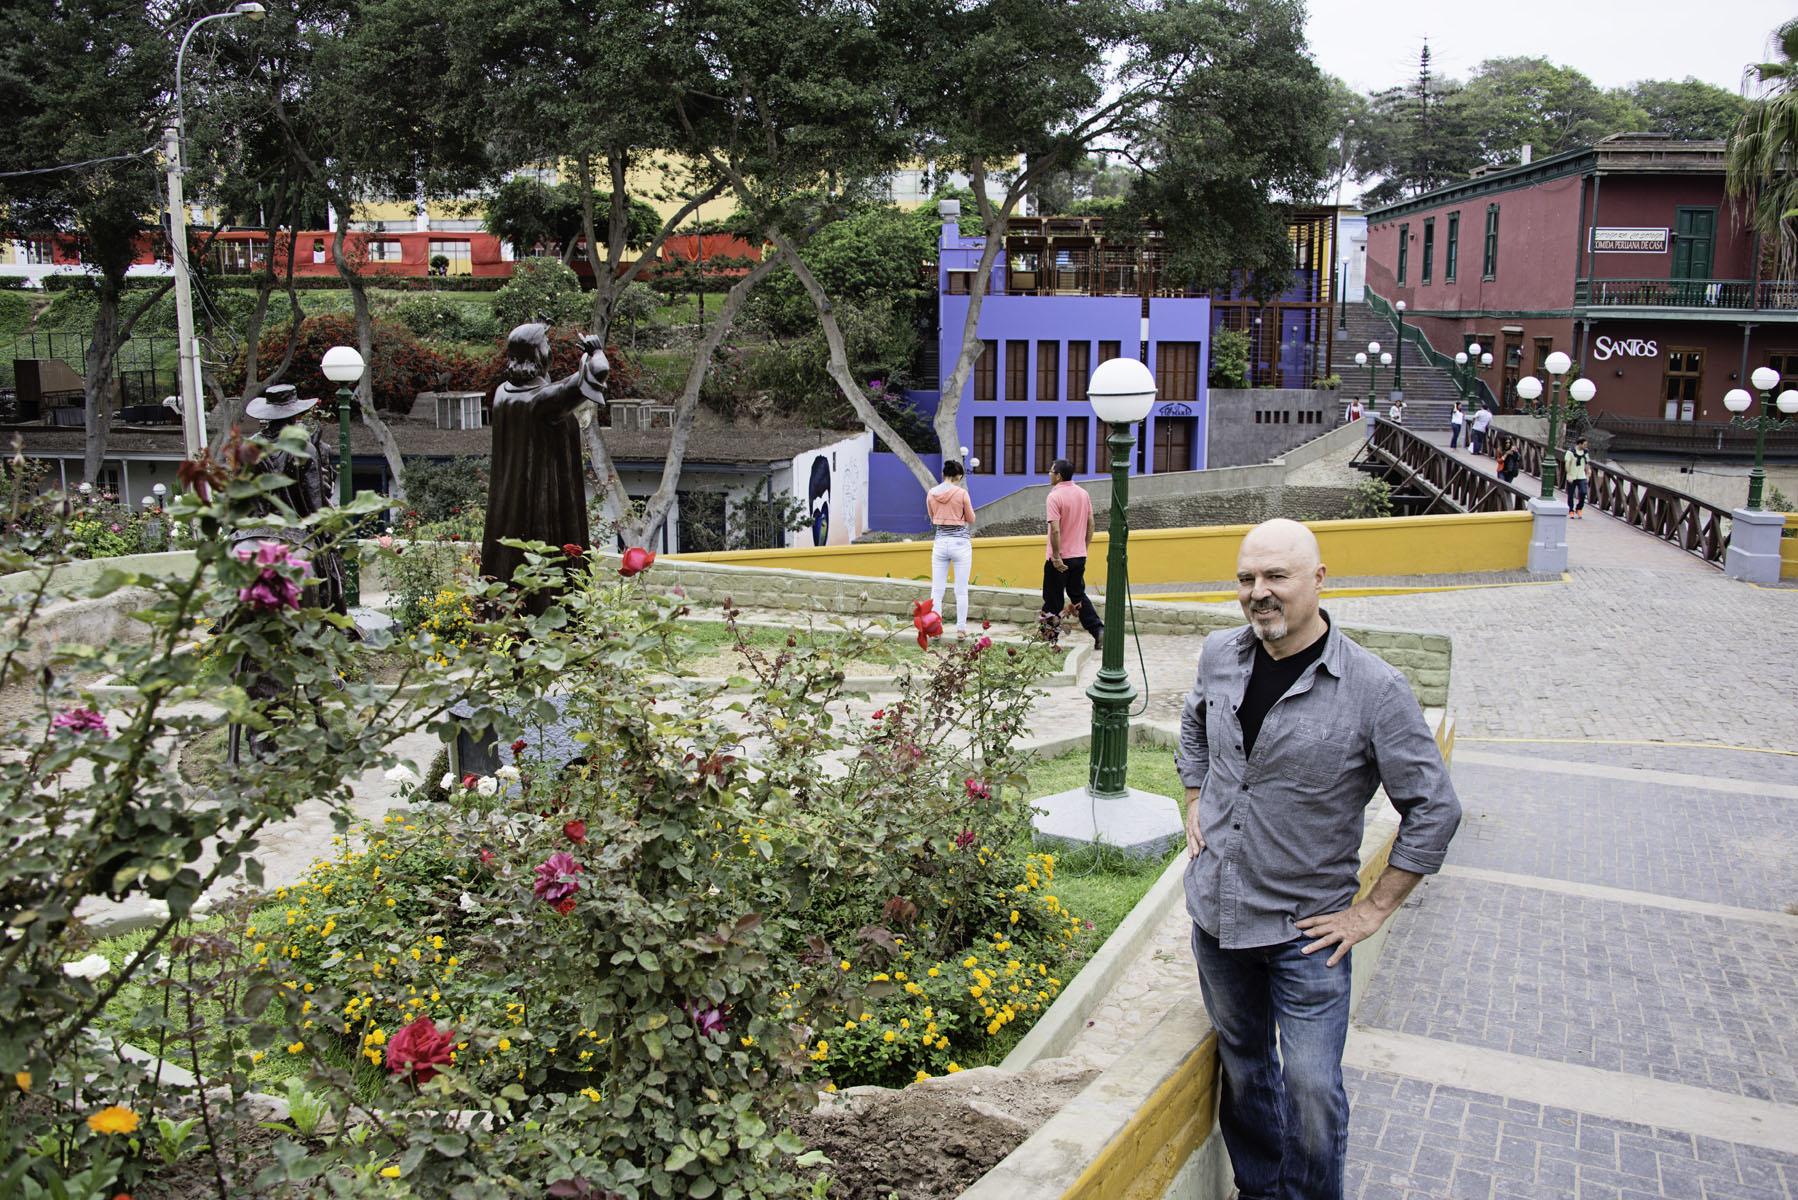 Fabio Posing Next to Flowers in Barranco Lima